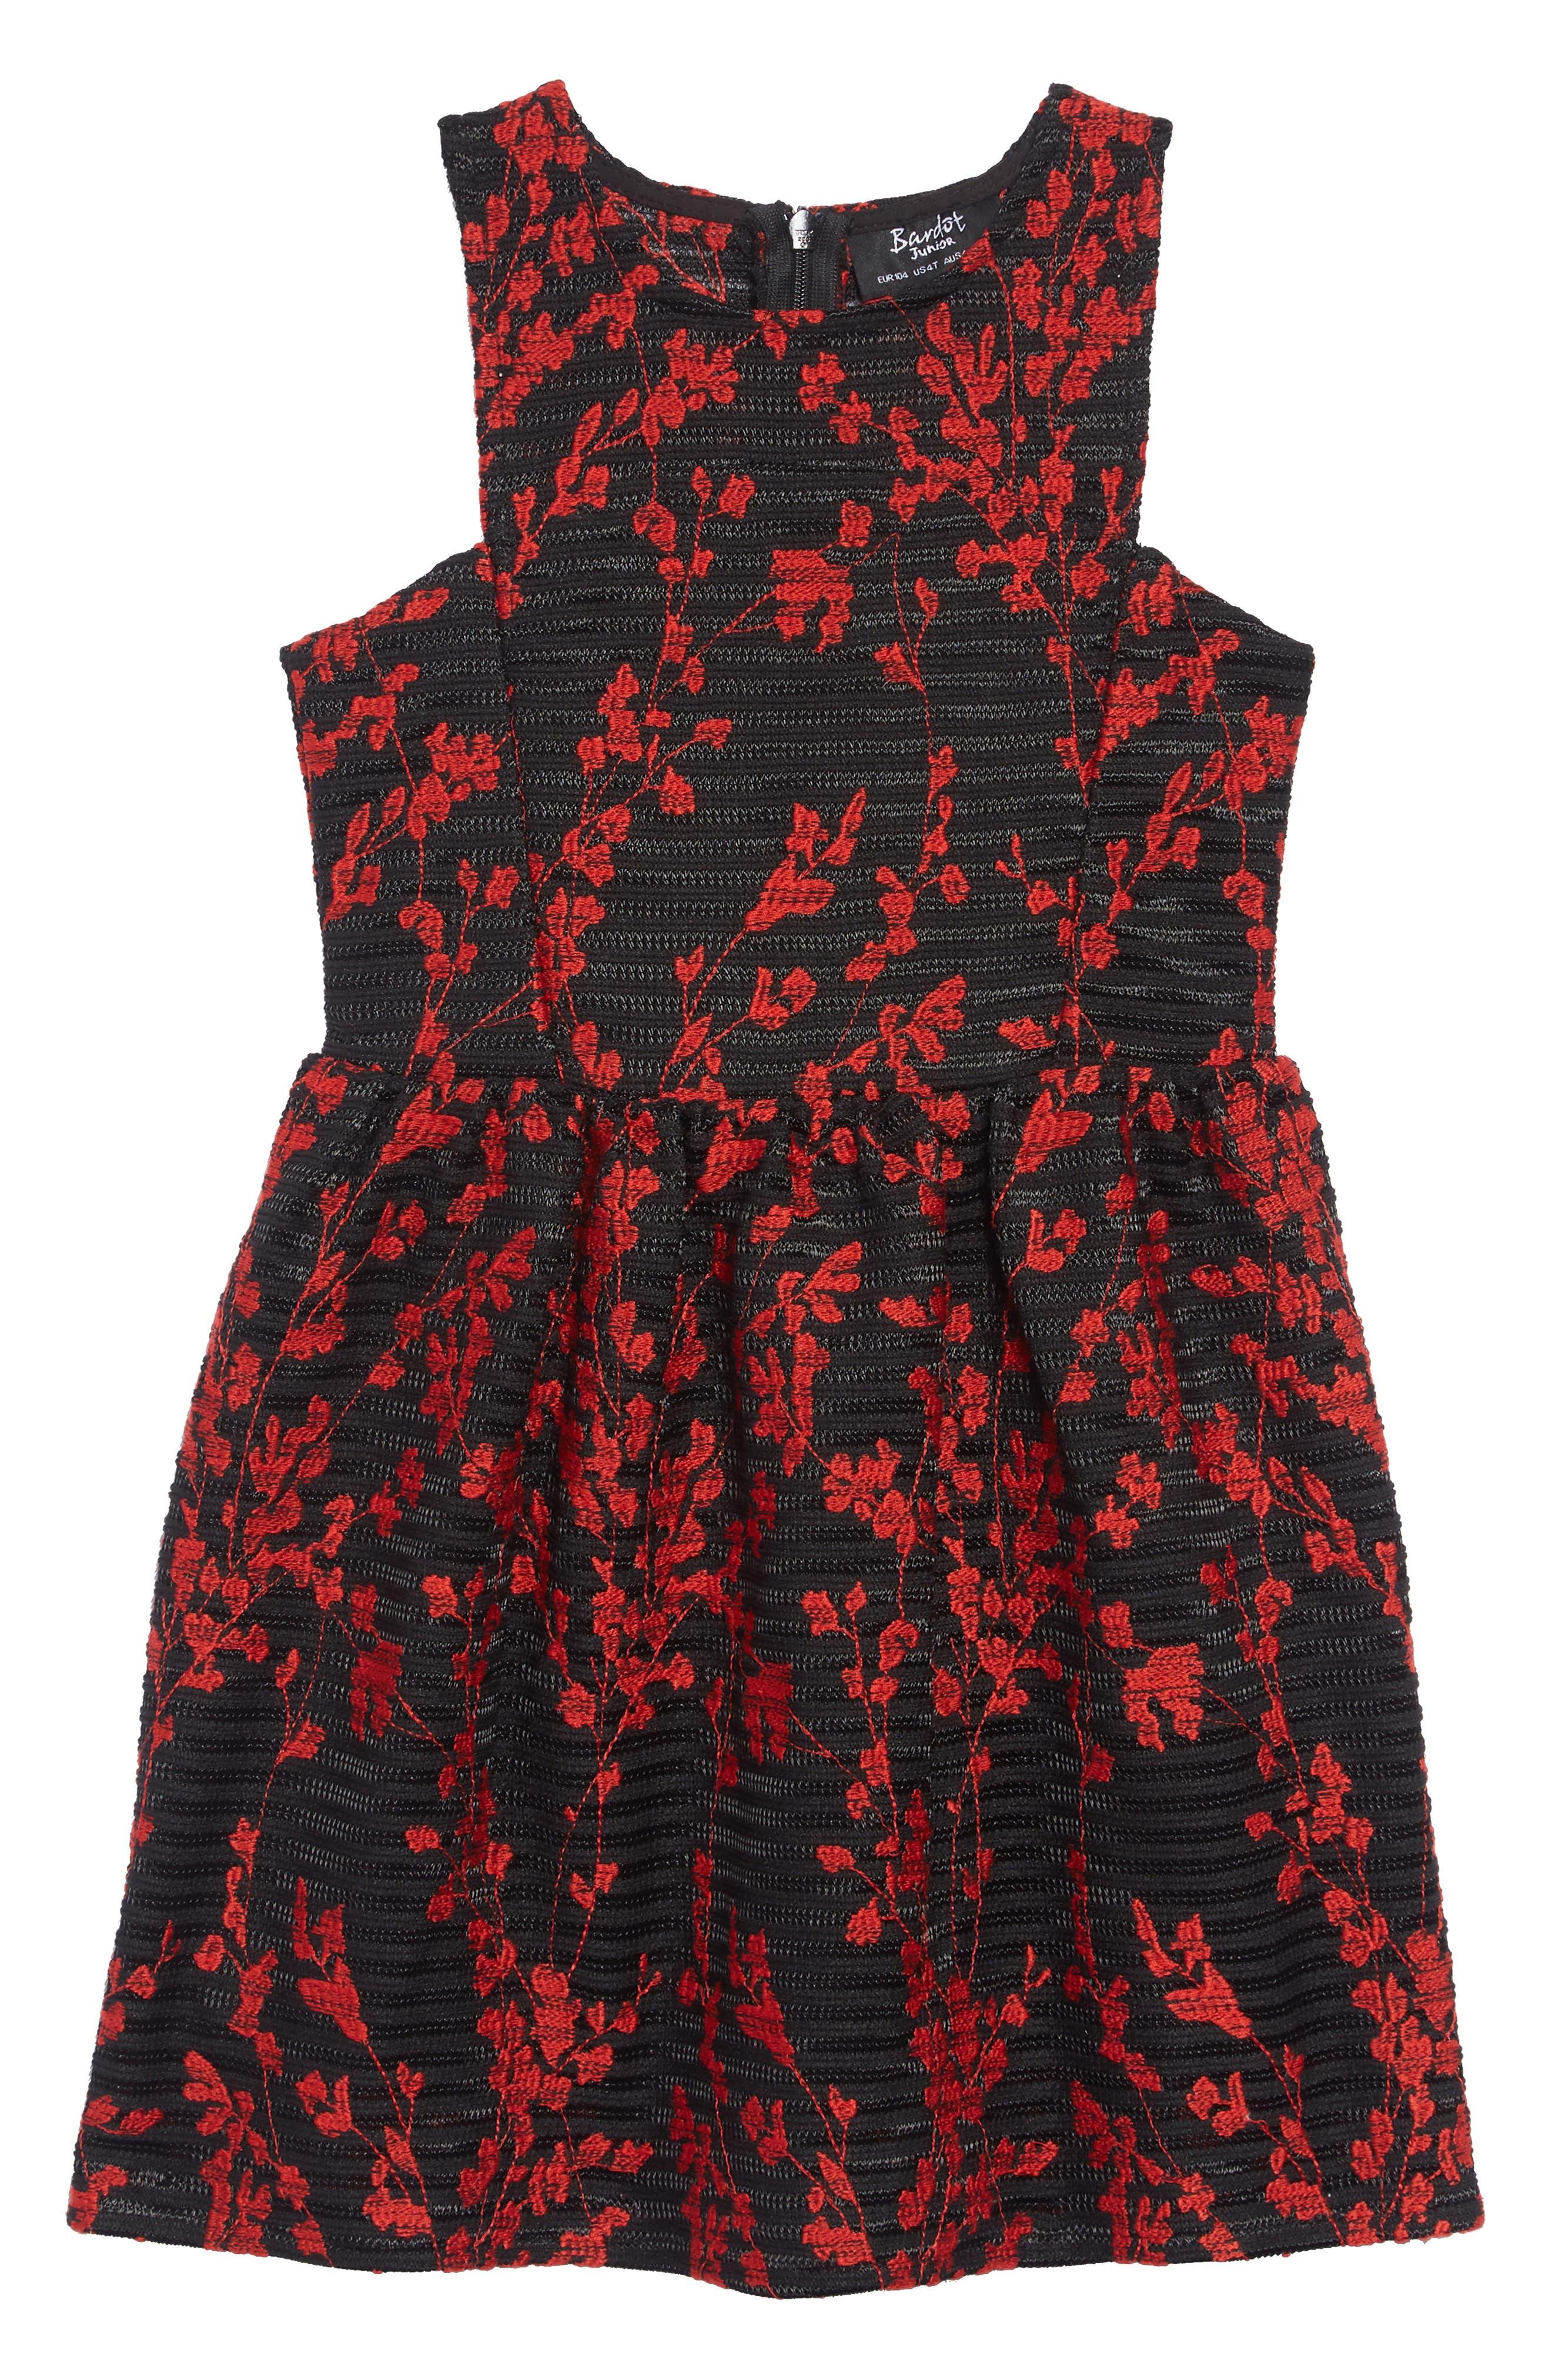 Mercer Flower Embroidered Dress,                             Main thumbnail 1, color,                             BLACK